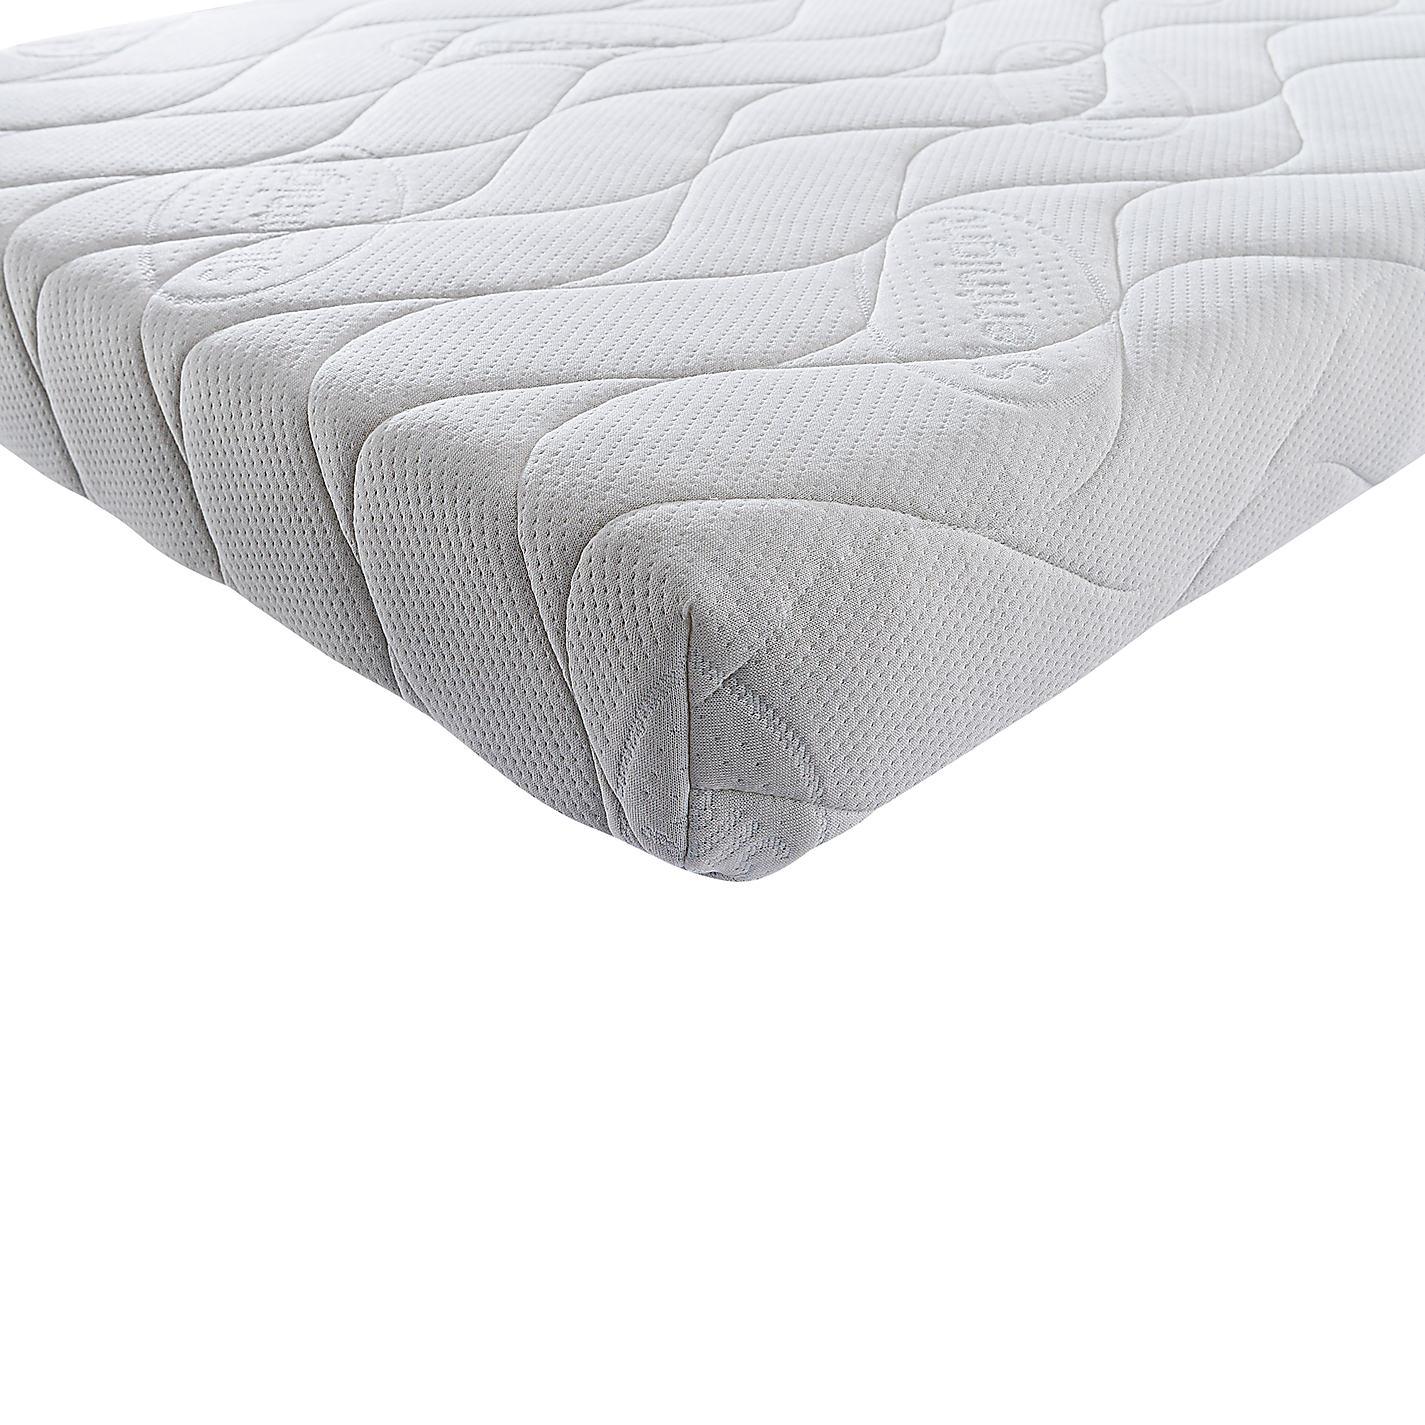 Silentnight Safe Nights Memory Wool Baby Cotbed Mattress 140 X 70cm Online At Johnlewis